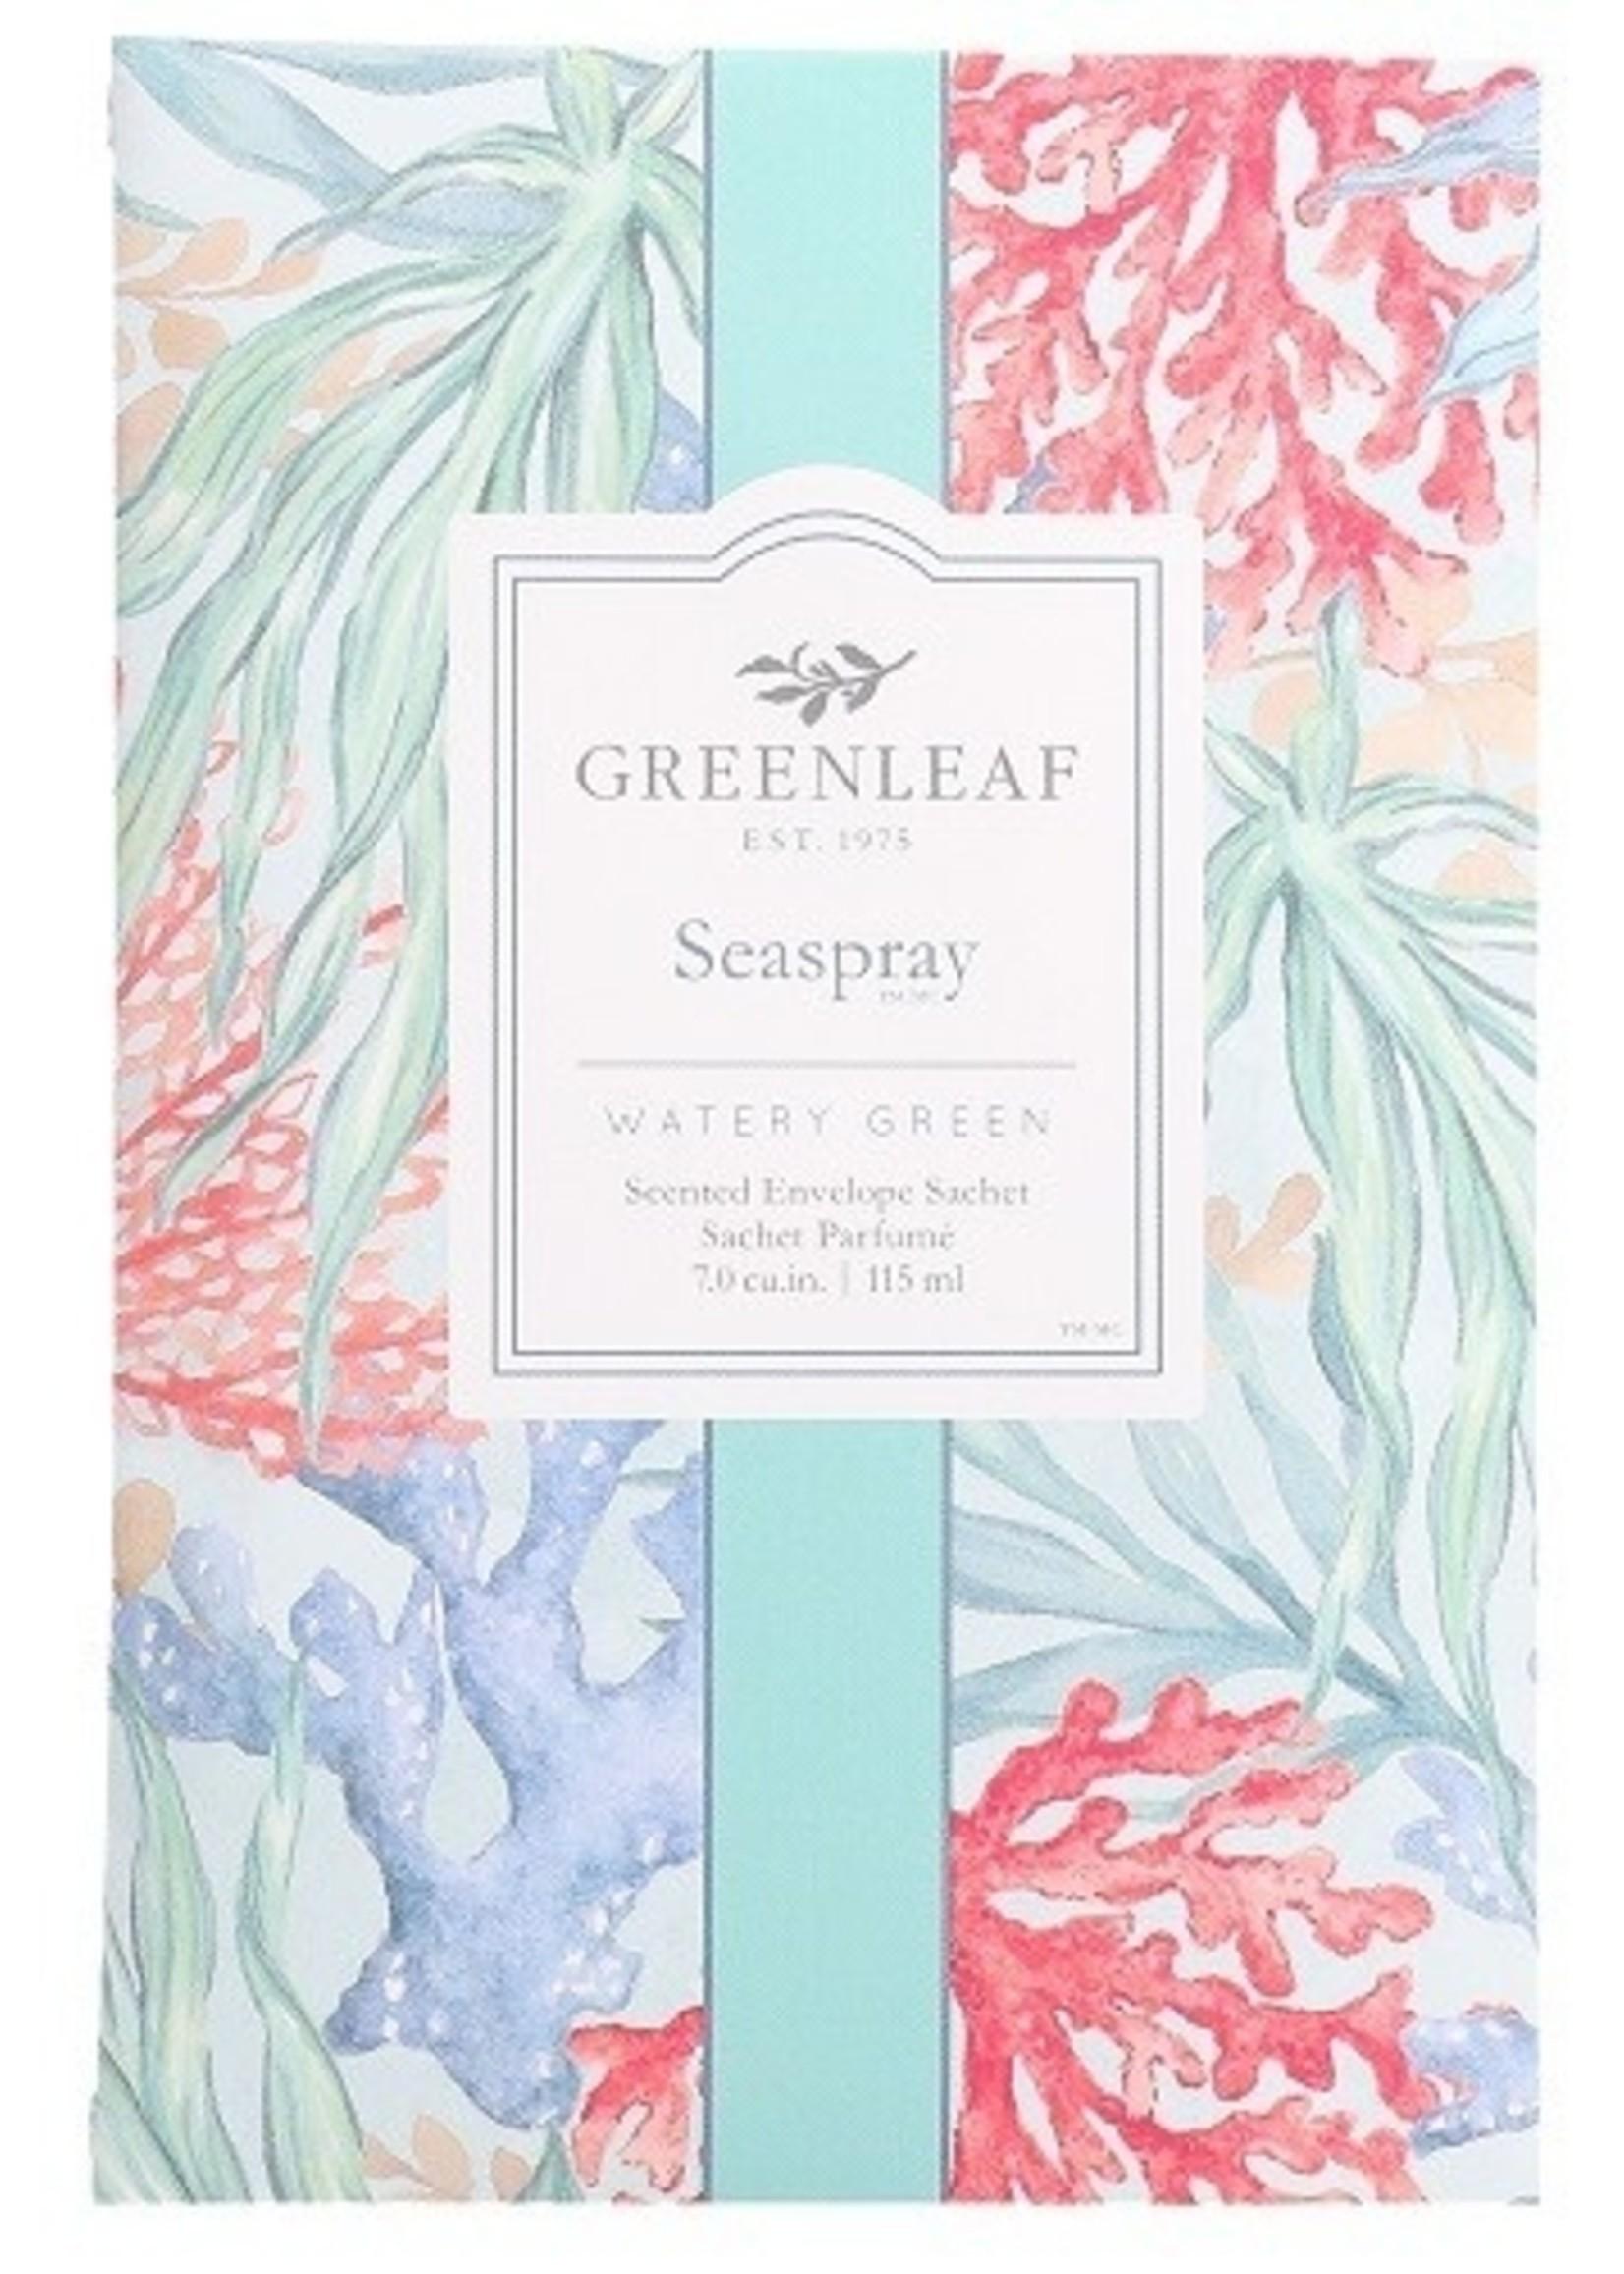 Greenleaf Greenleaf Geurzakje Seaspray